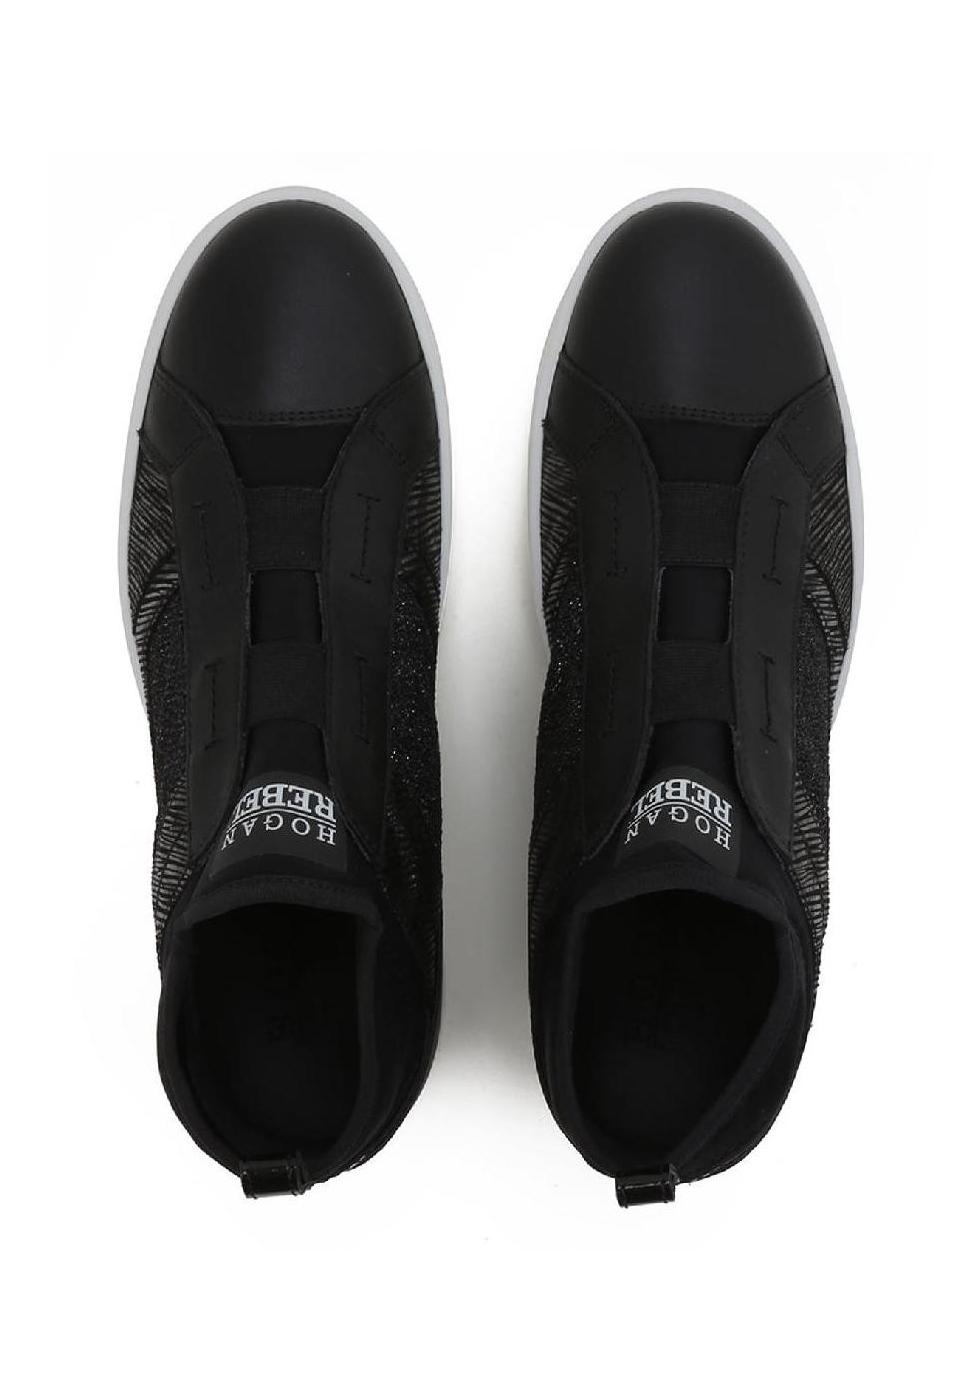 Hogan Rebel Women S Slip Ons Sneakers Black Leather Italian Boutique